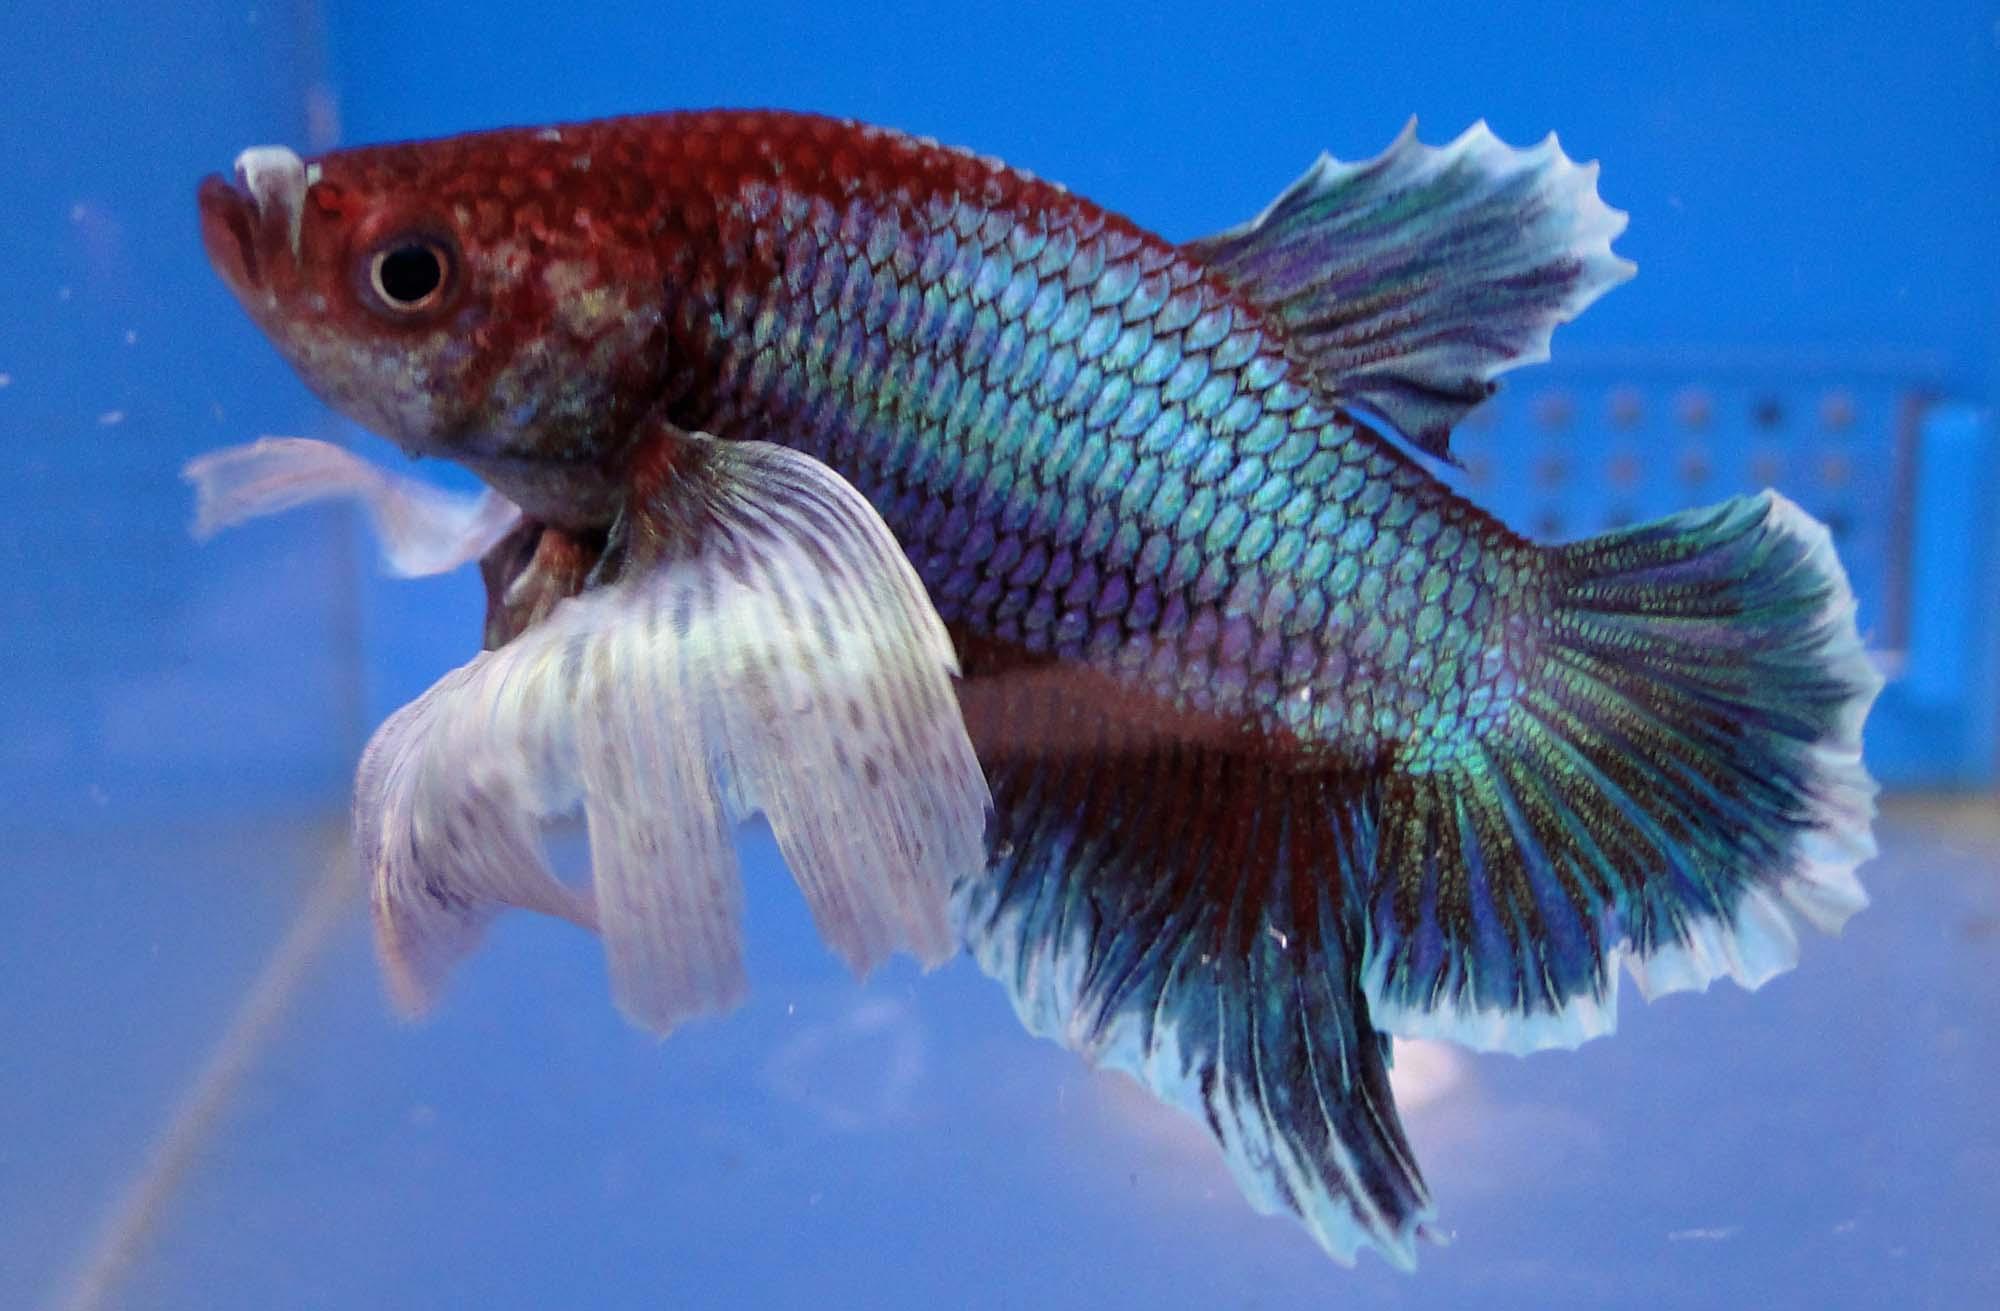 Betta Fish Care BreedingFeedingNamesDiseases Etc